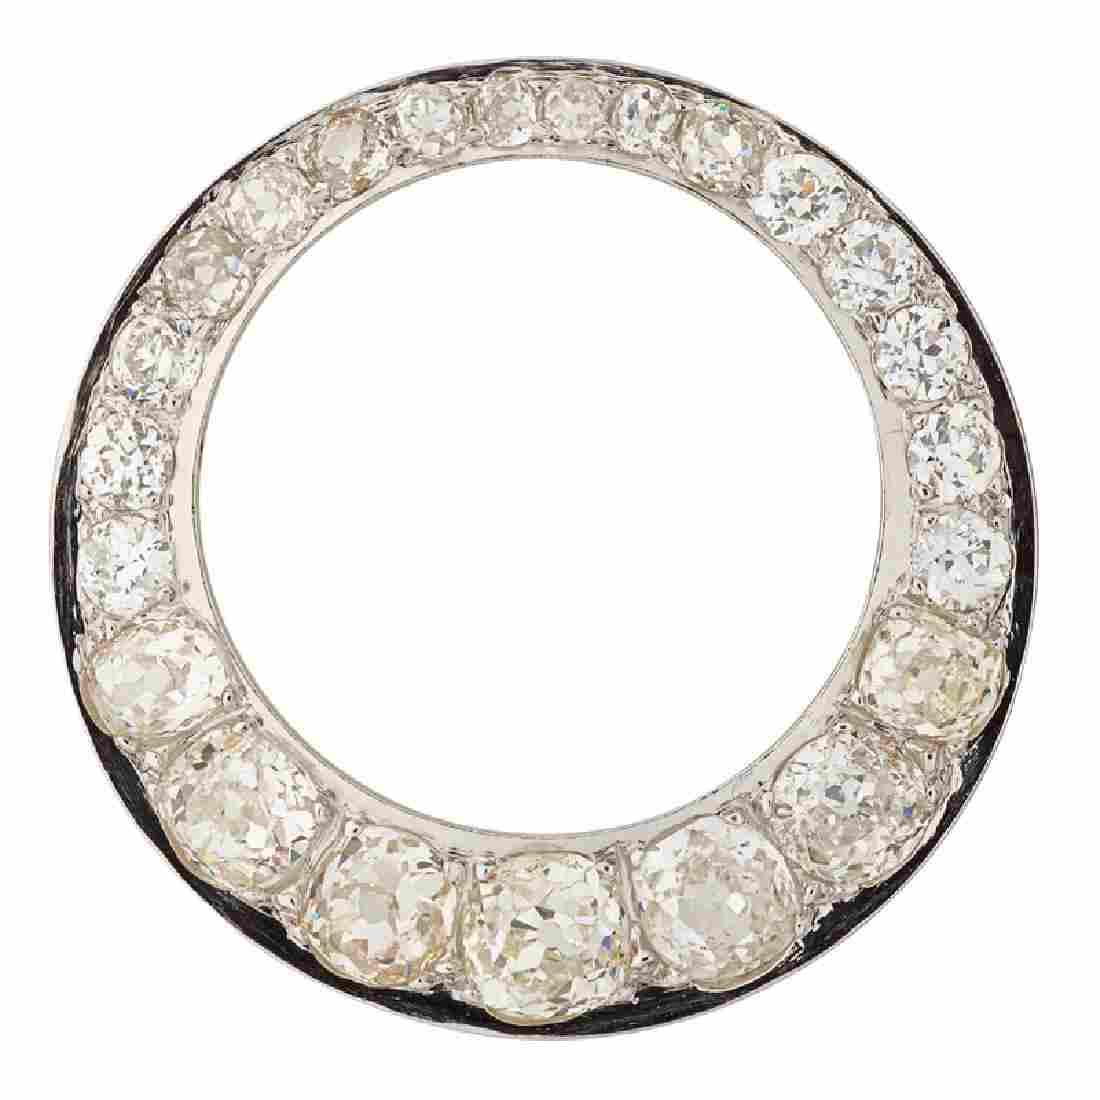 EDWARDIAN DIAMOND & PLATINUM CIRCLE BROOCH